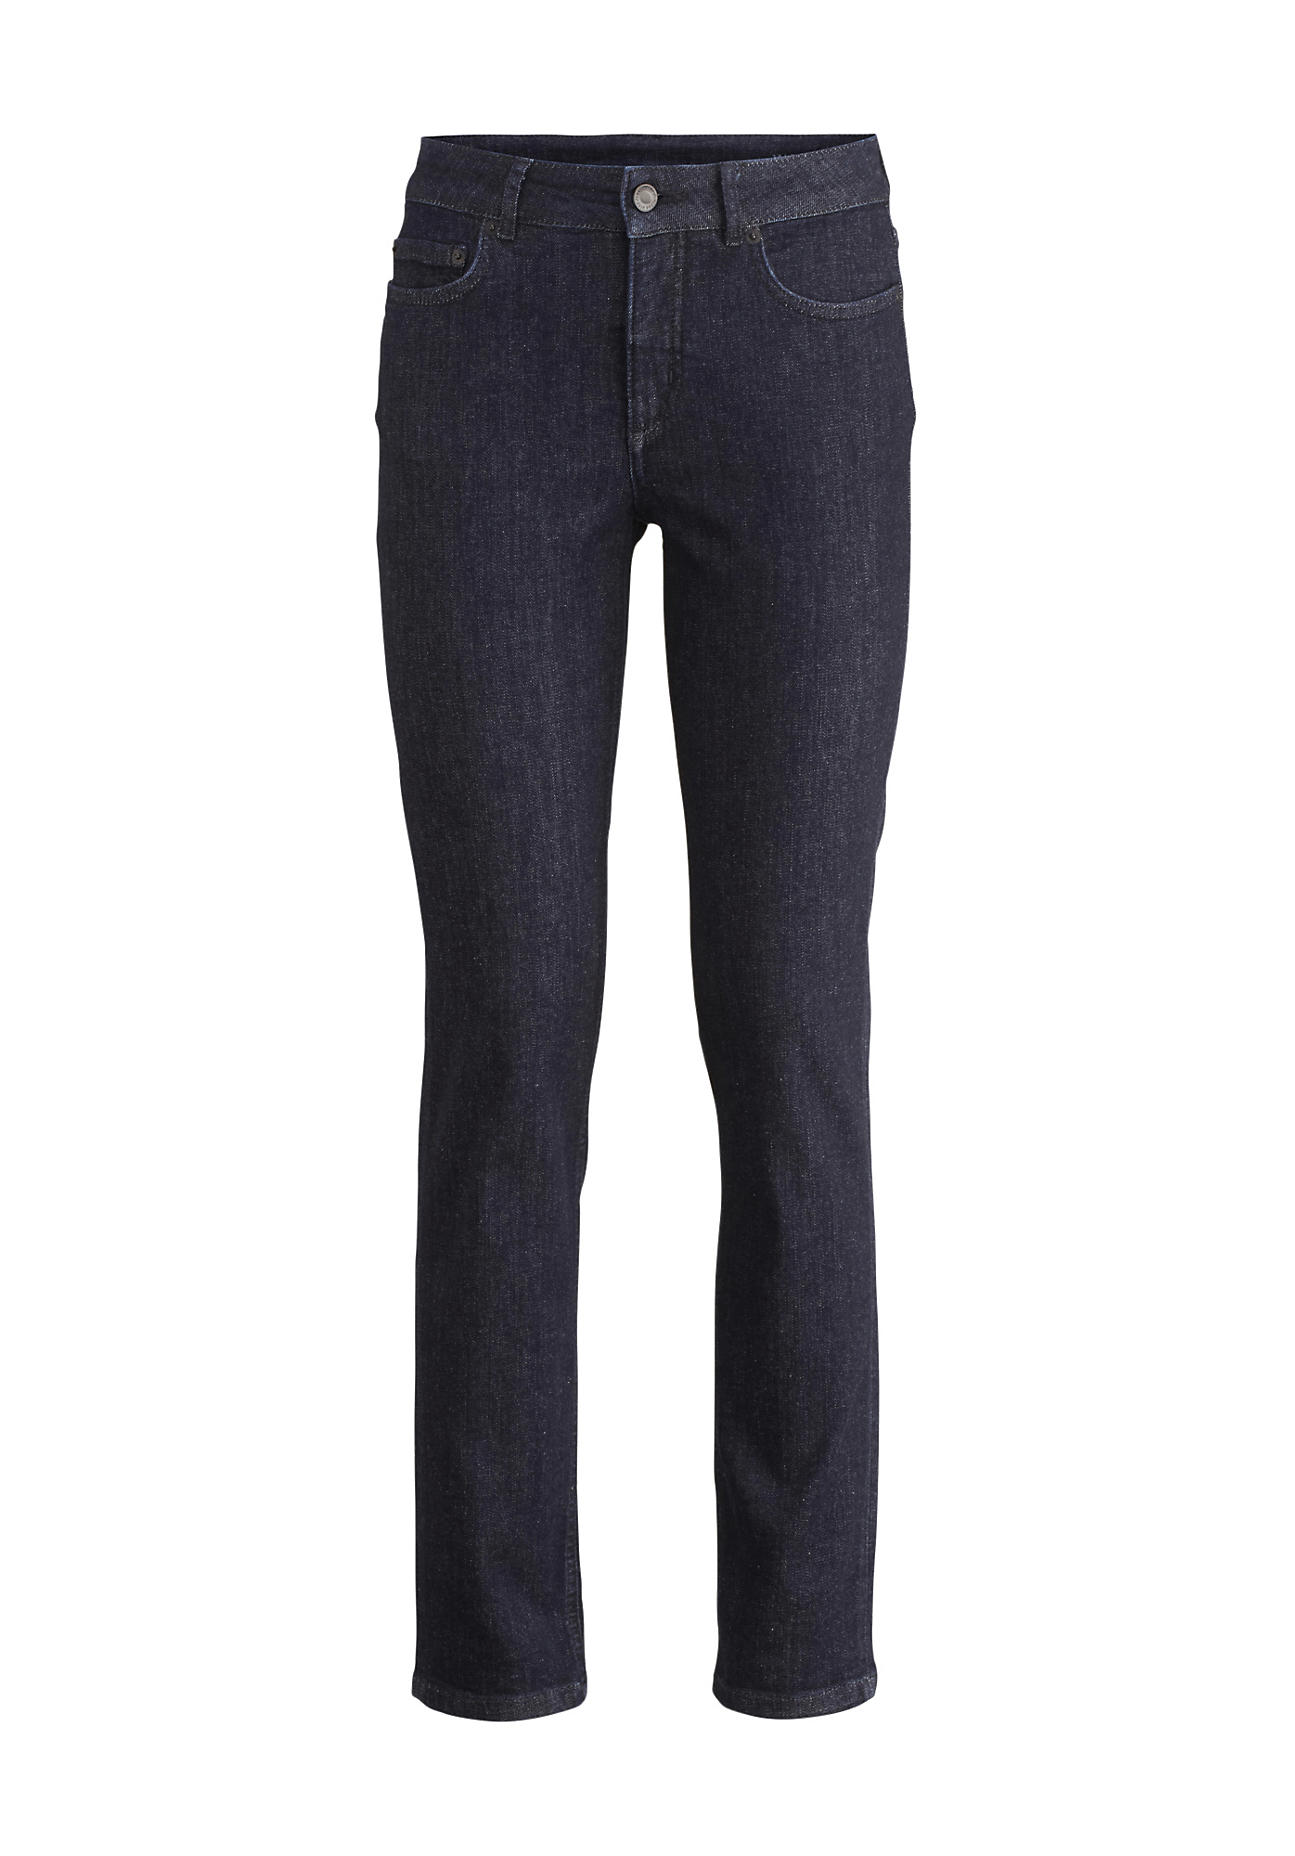 hessnatur Damen Jeans Lea Slim Fit aus Bio-Denim – blau – Größe 26/30